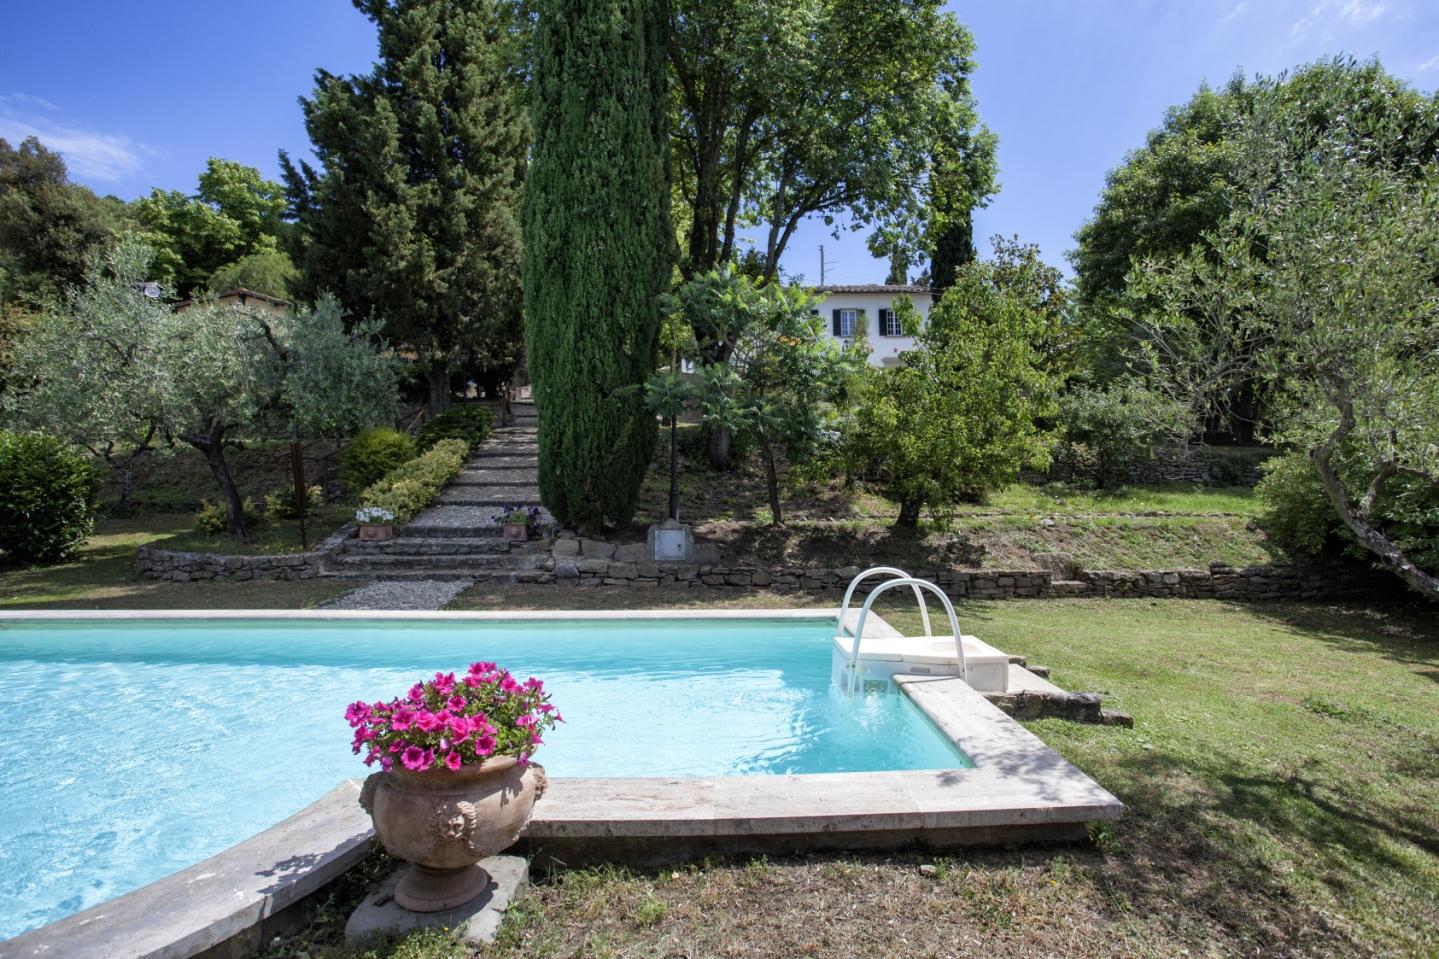 Ferienhaus Villa 6 pax (367992), Cortona, Arezzo, Toskana, Italien, Bild 7